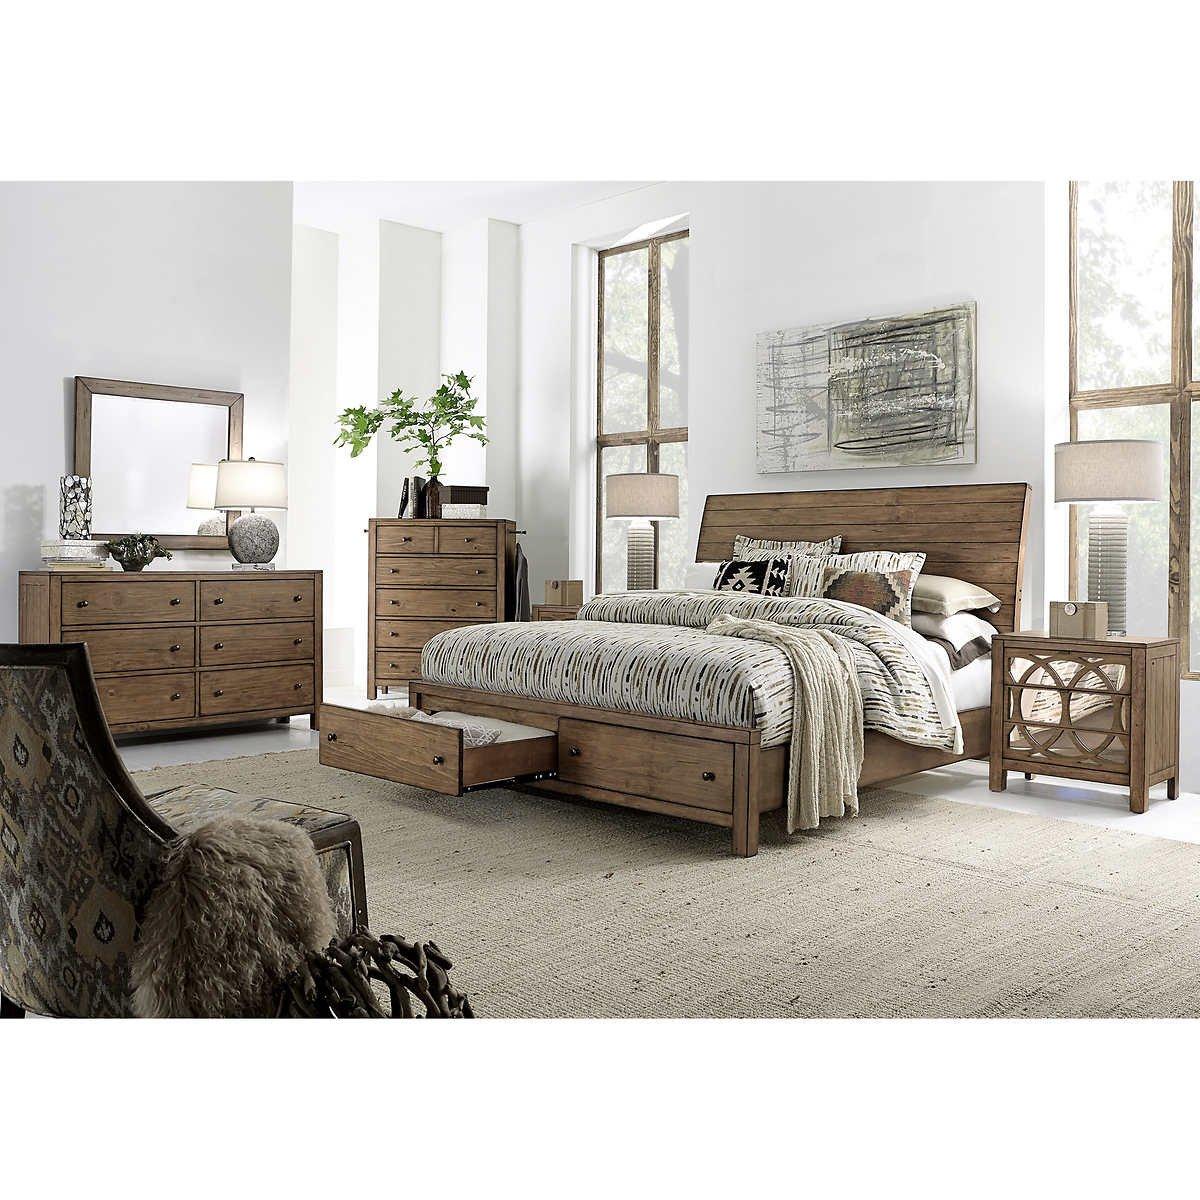 Costco Bedroom Furniture Reviews Fresh Audrey 6 Piece King Storage Bedroom Set